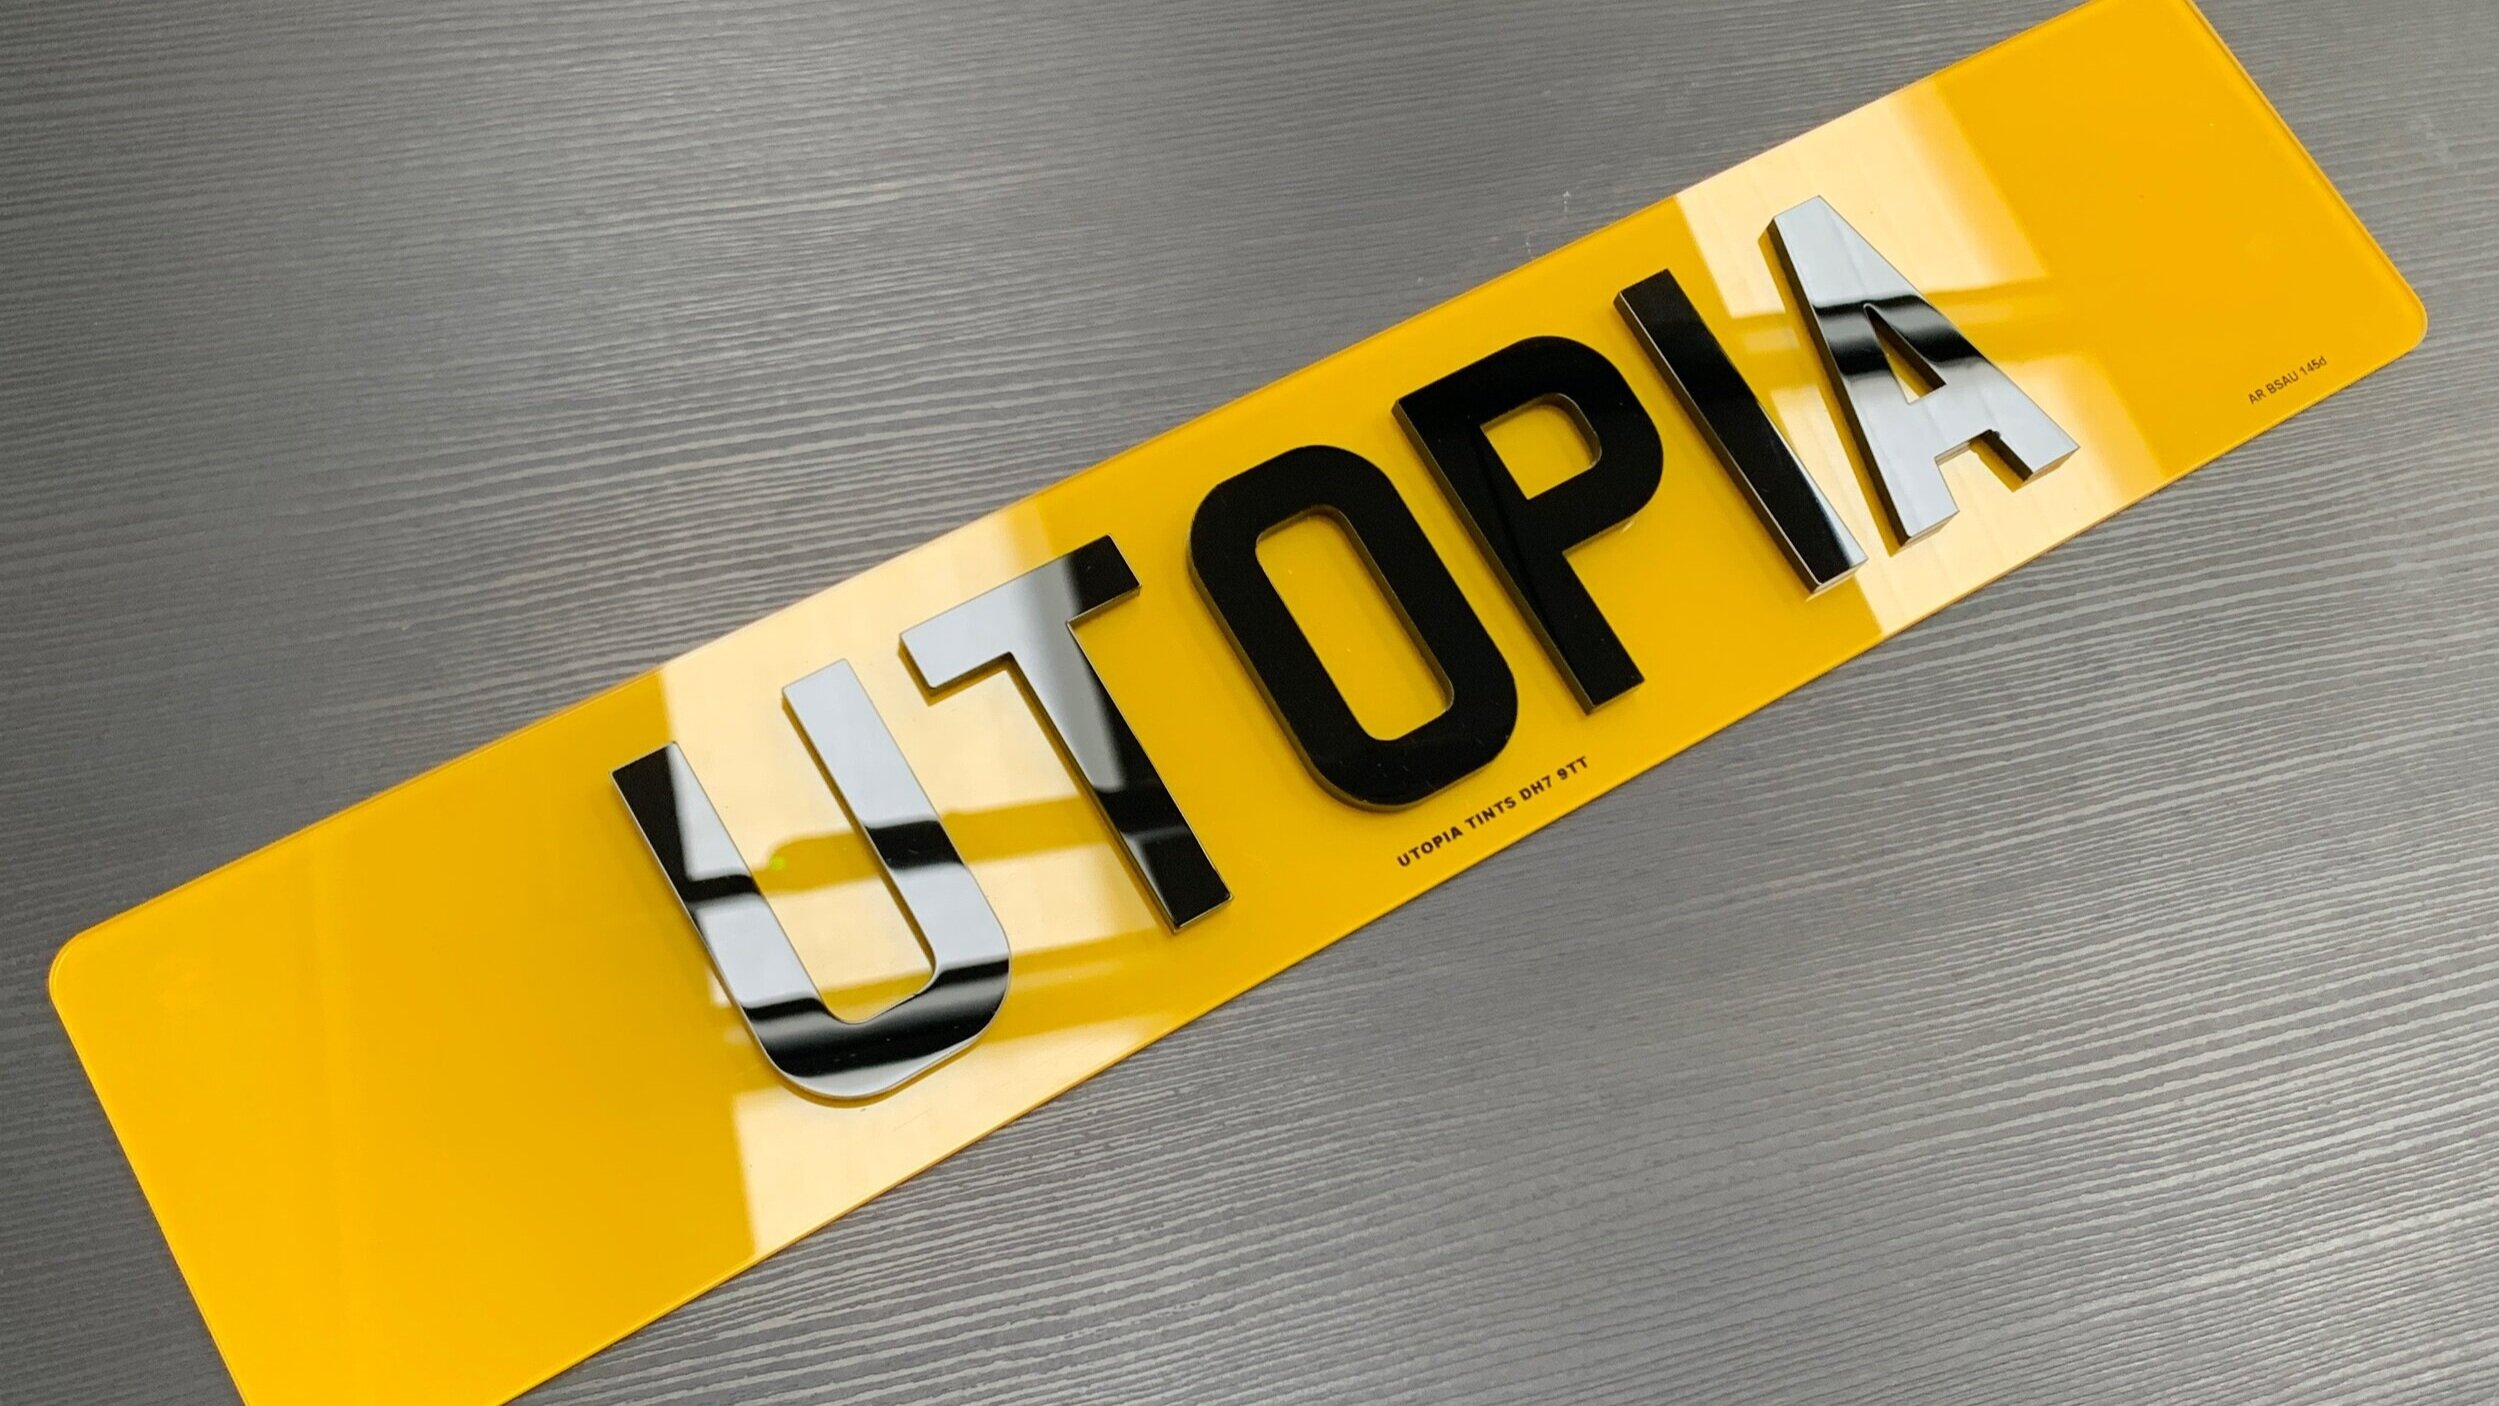 1 X REAR CAR REGISTRATION NUMBER PLATE 3D FONT BLACK BORDER NO DOCUMENTS